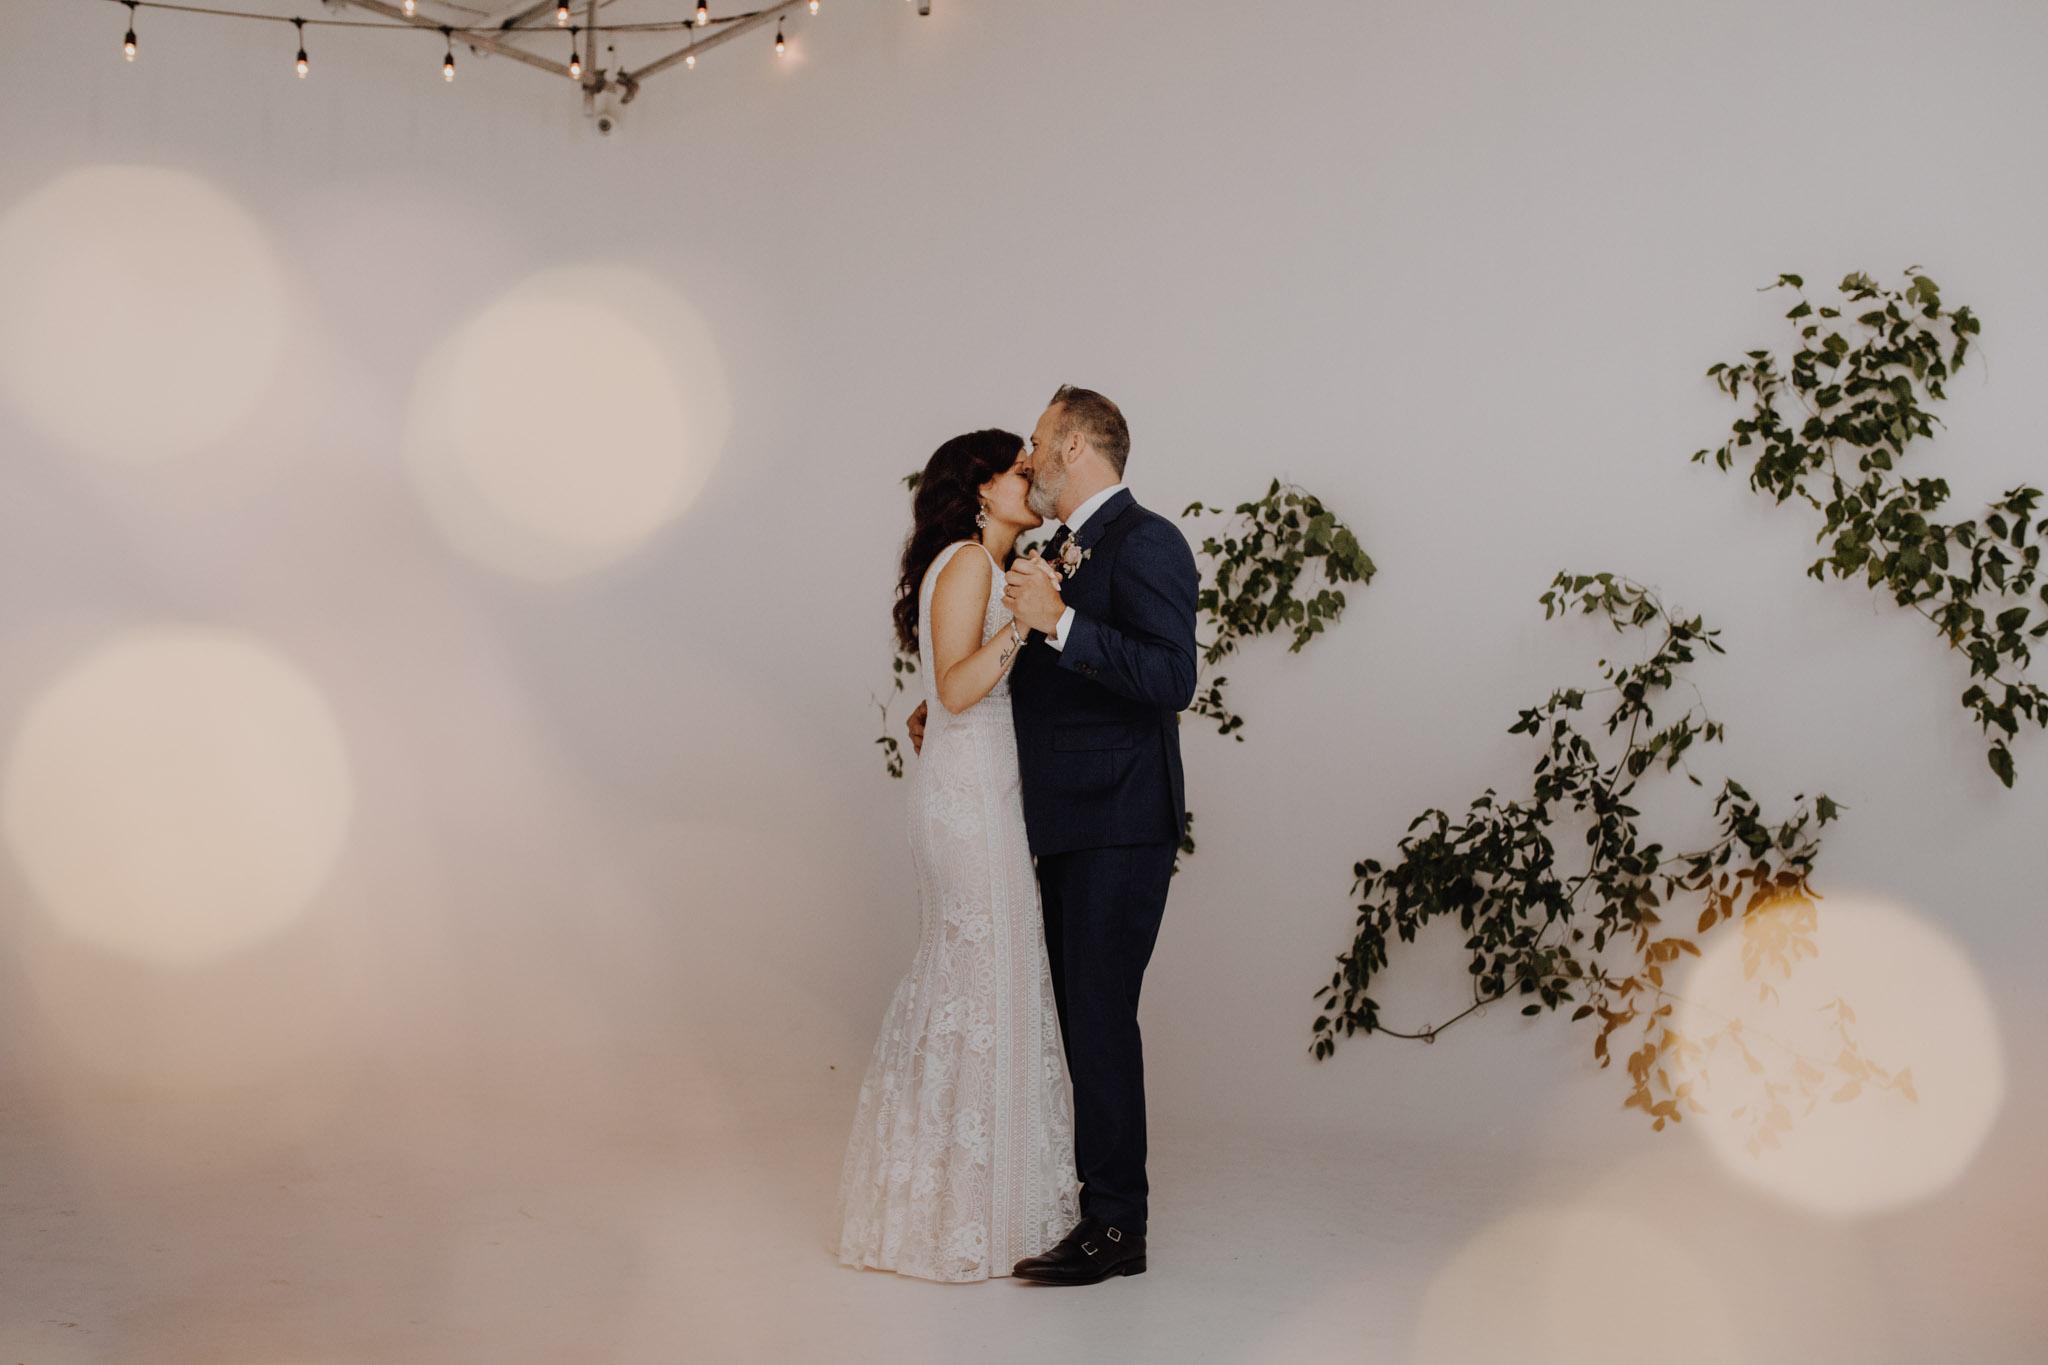 District 28 Wedding Toronto - first dance white backdrop